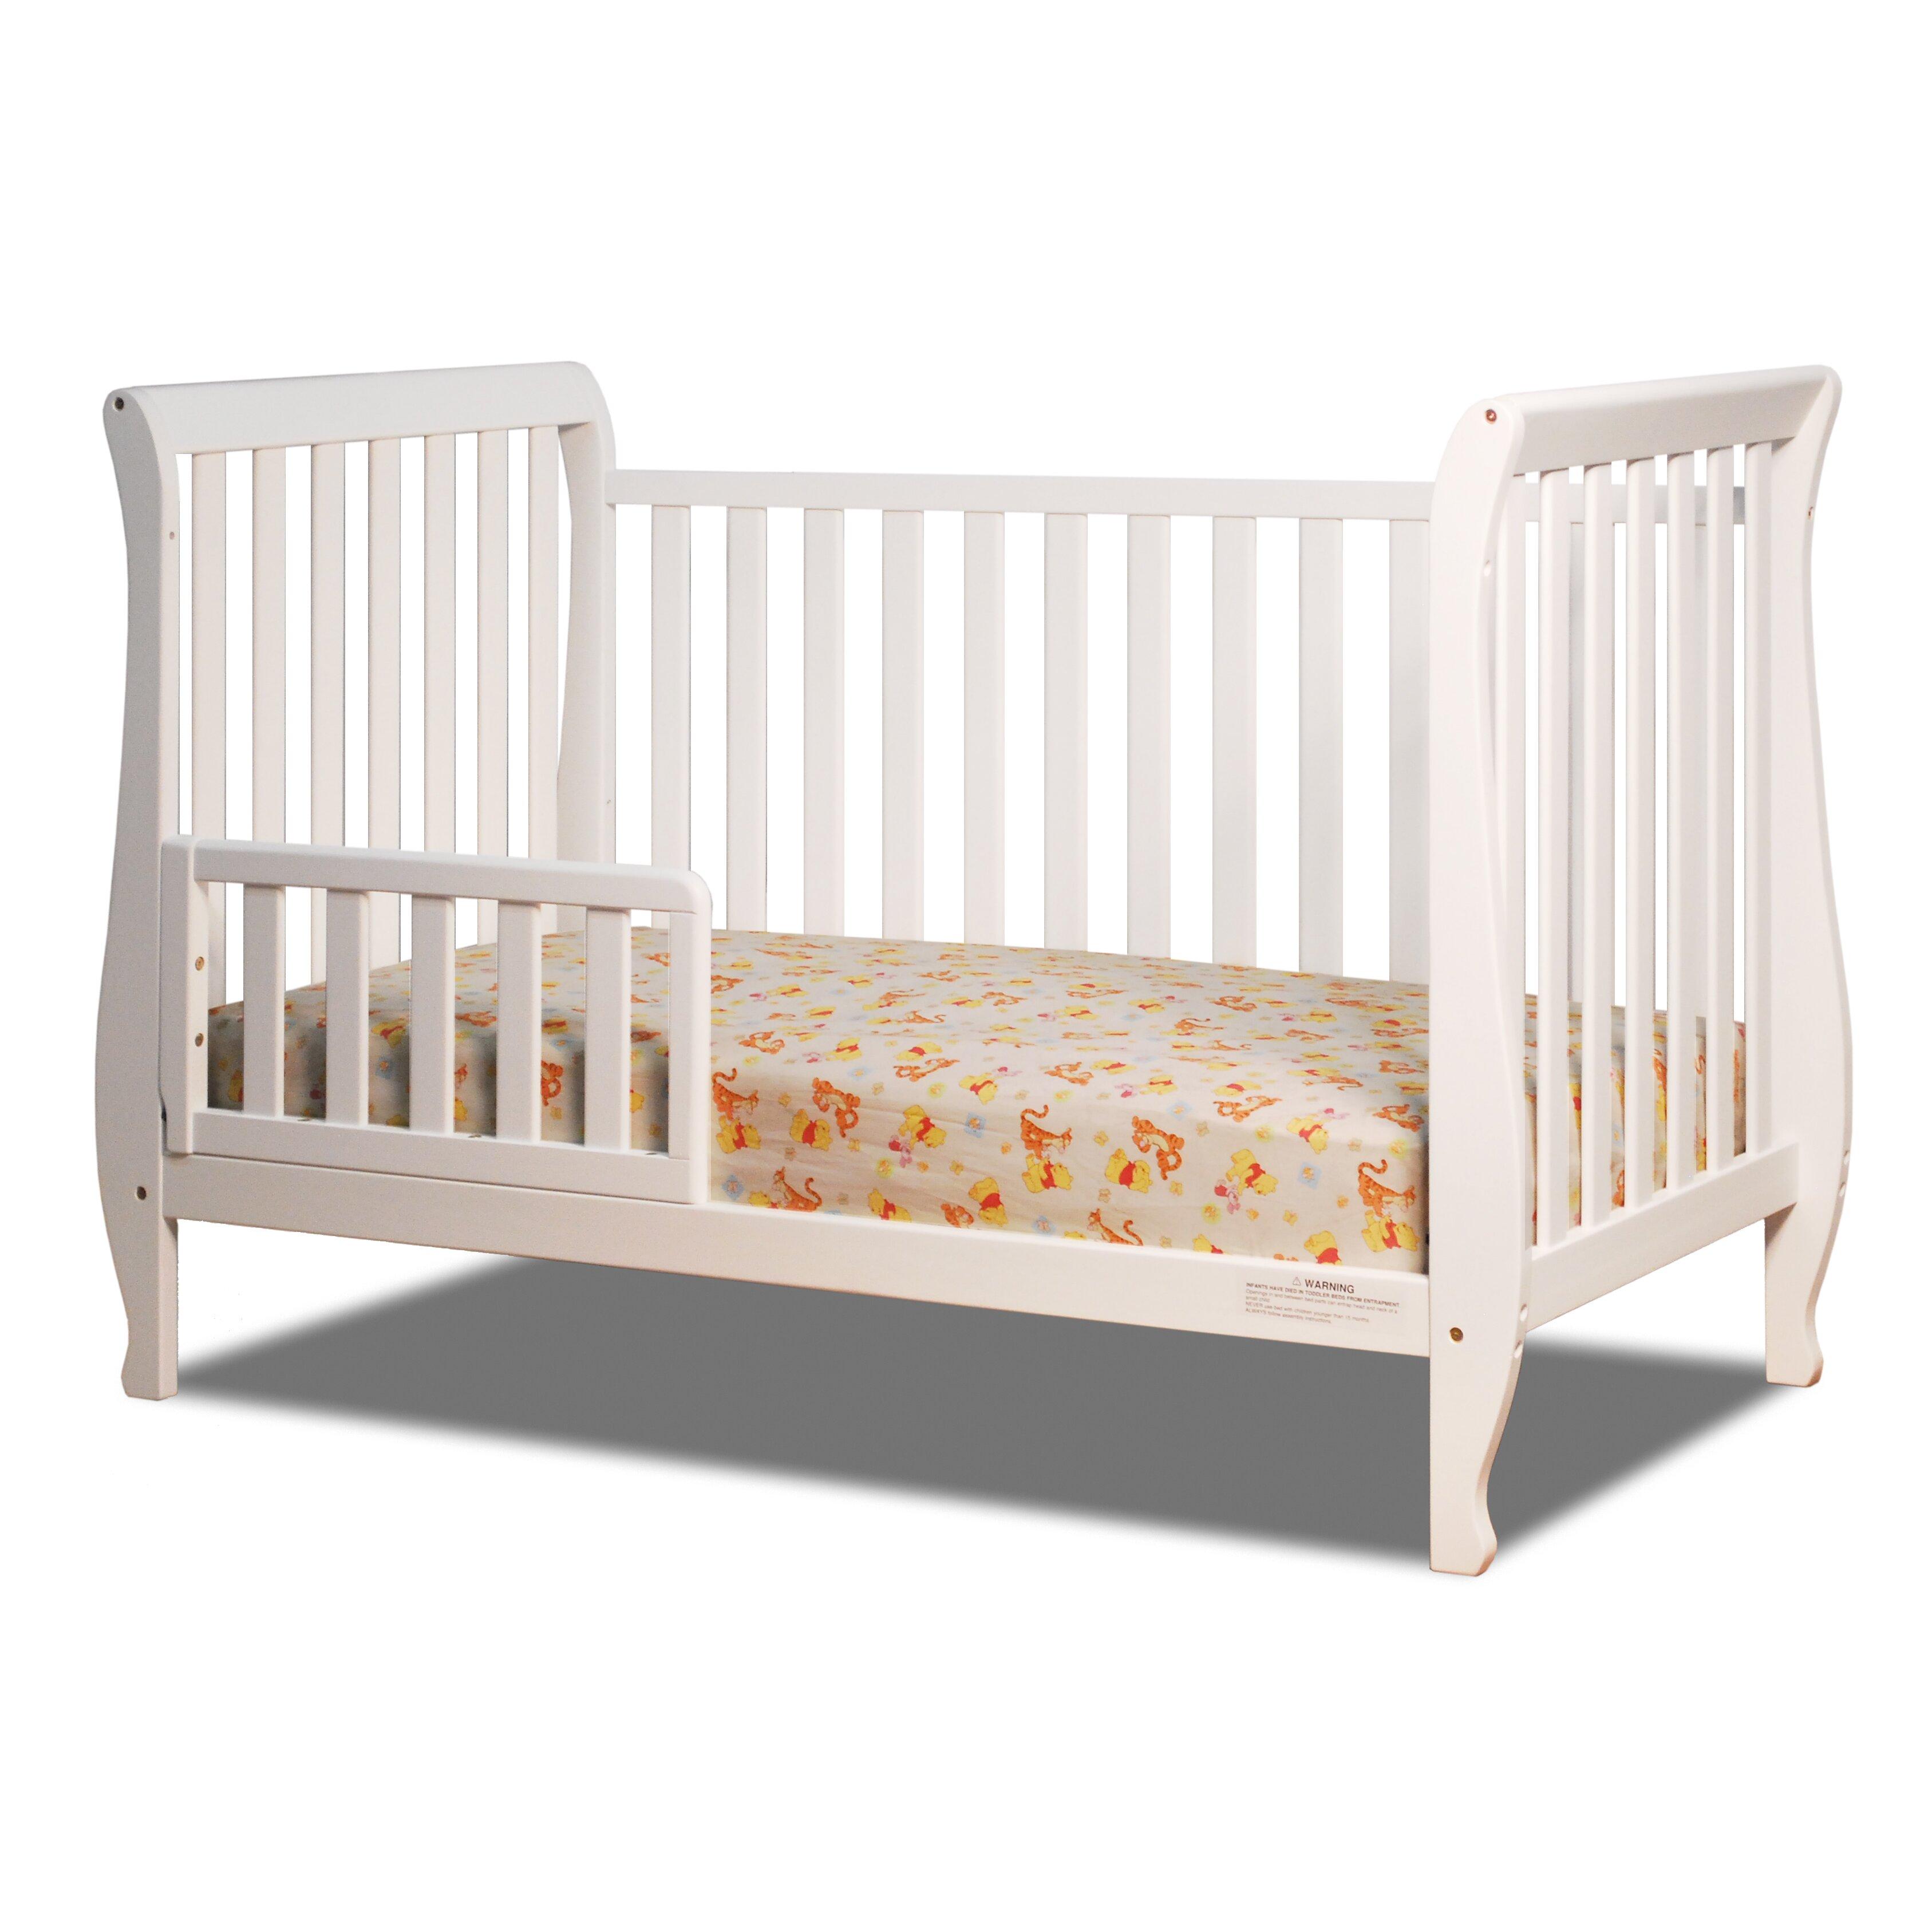 Baby bed furniture - Afg Baby Furniture Naomi 4 In 1 Convertible Crib